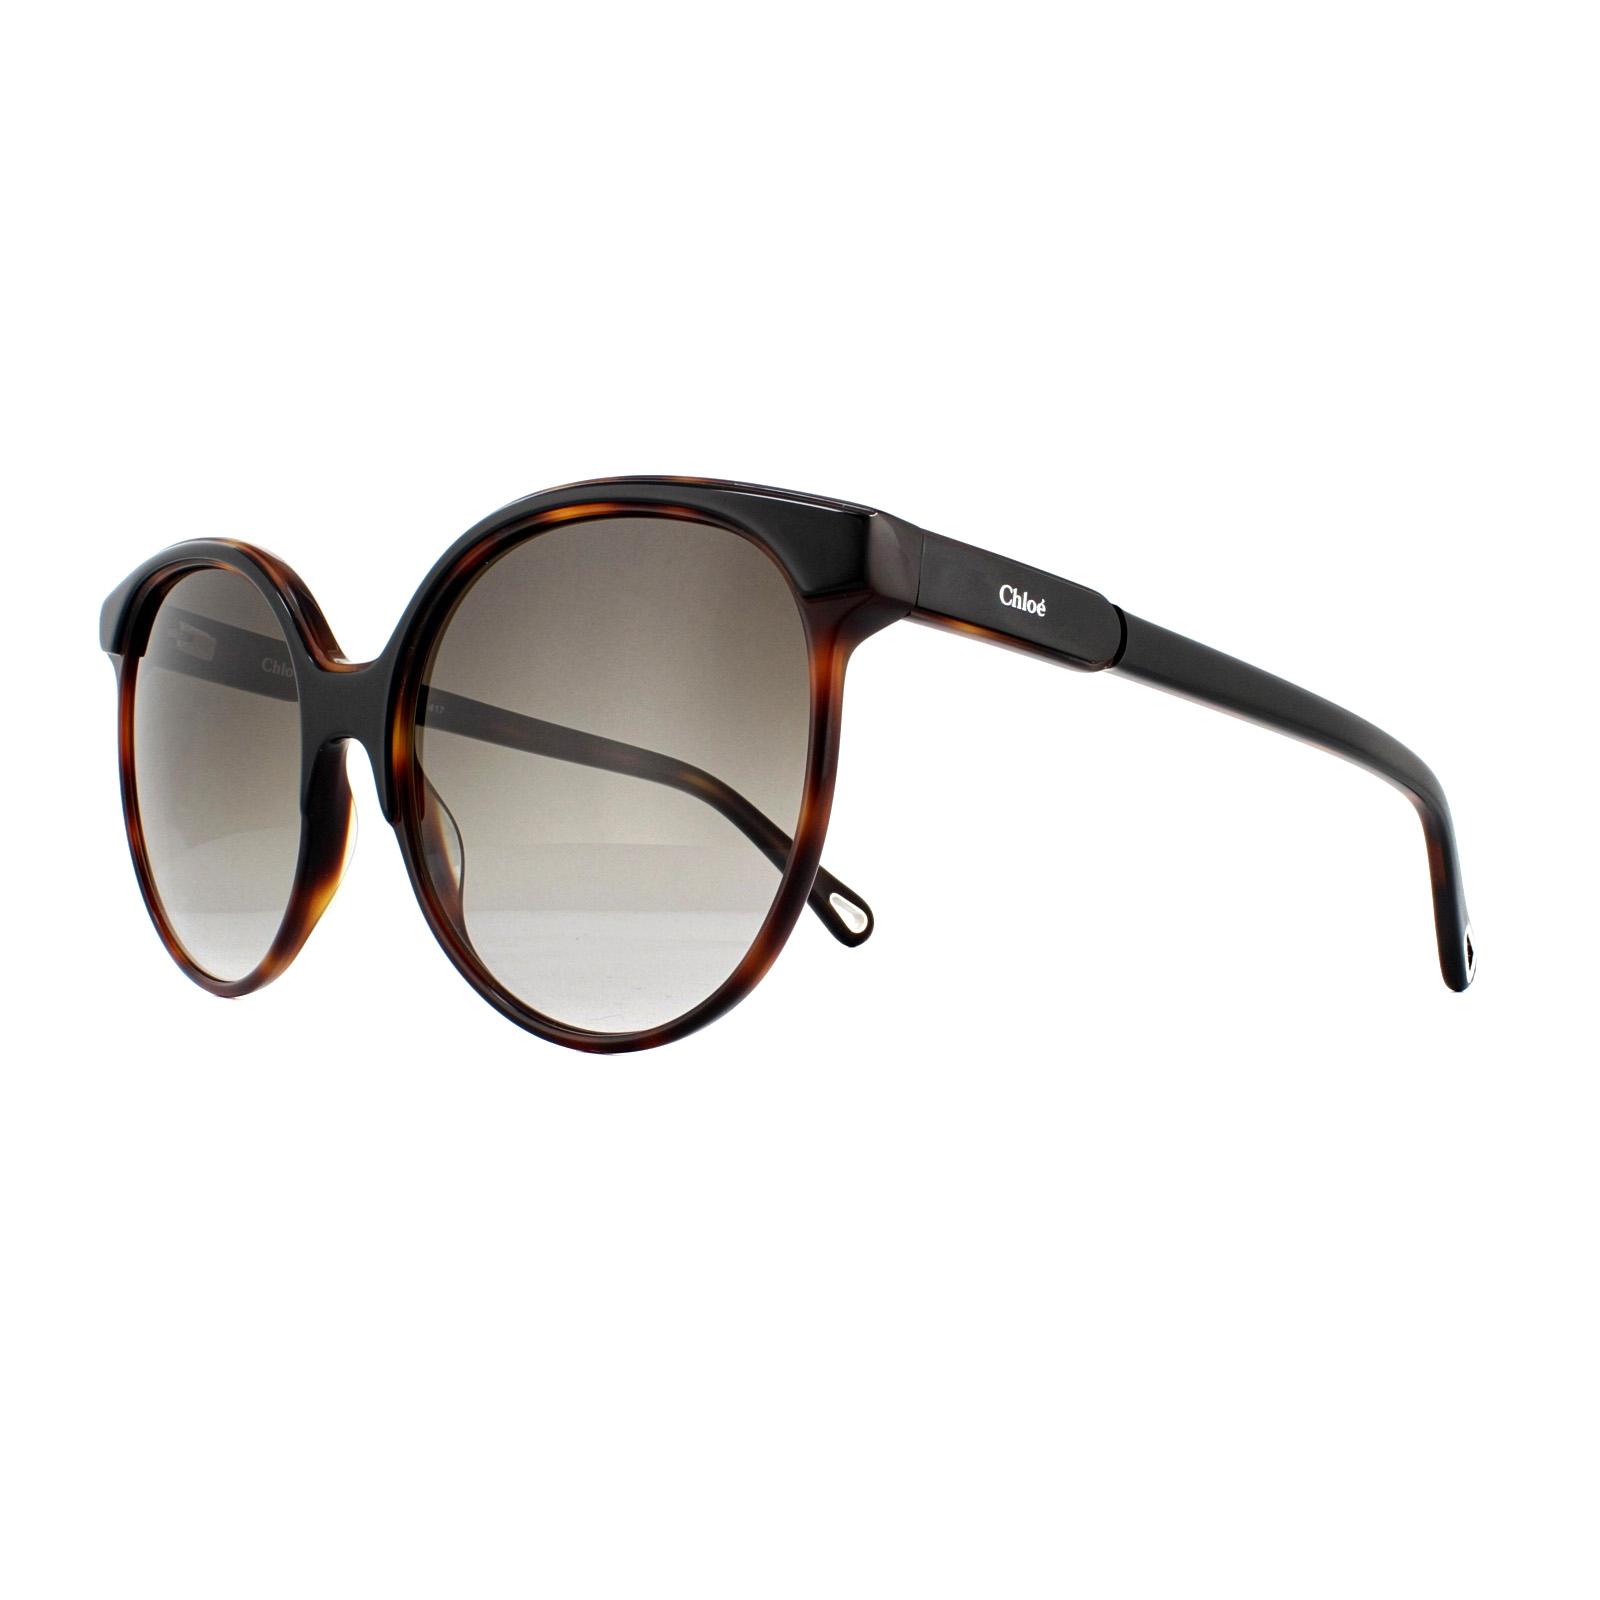 38e8a36d3a7 Cheap Chloe CE733S Sunglasses - Discounted Sunglasses